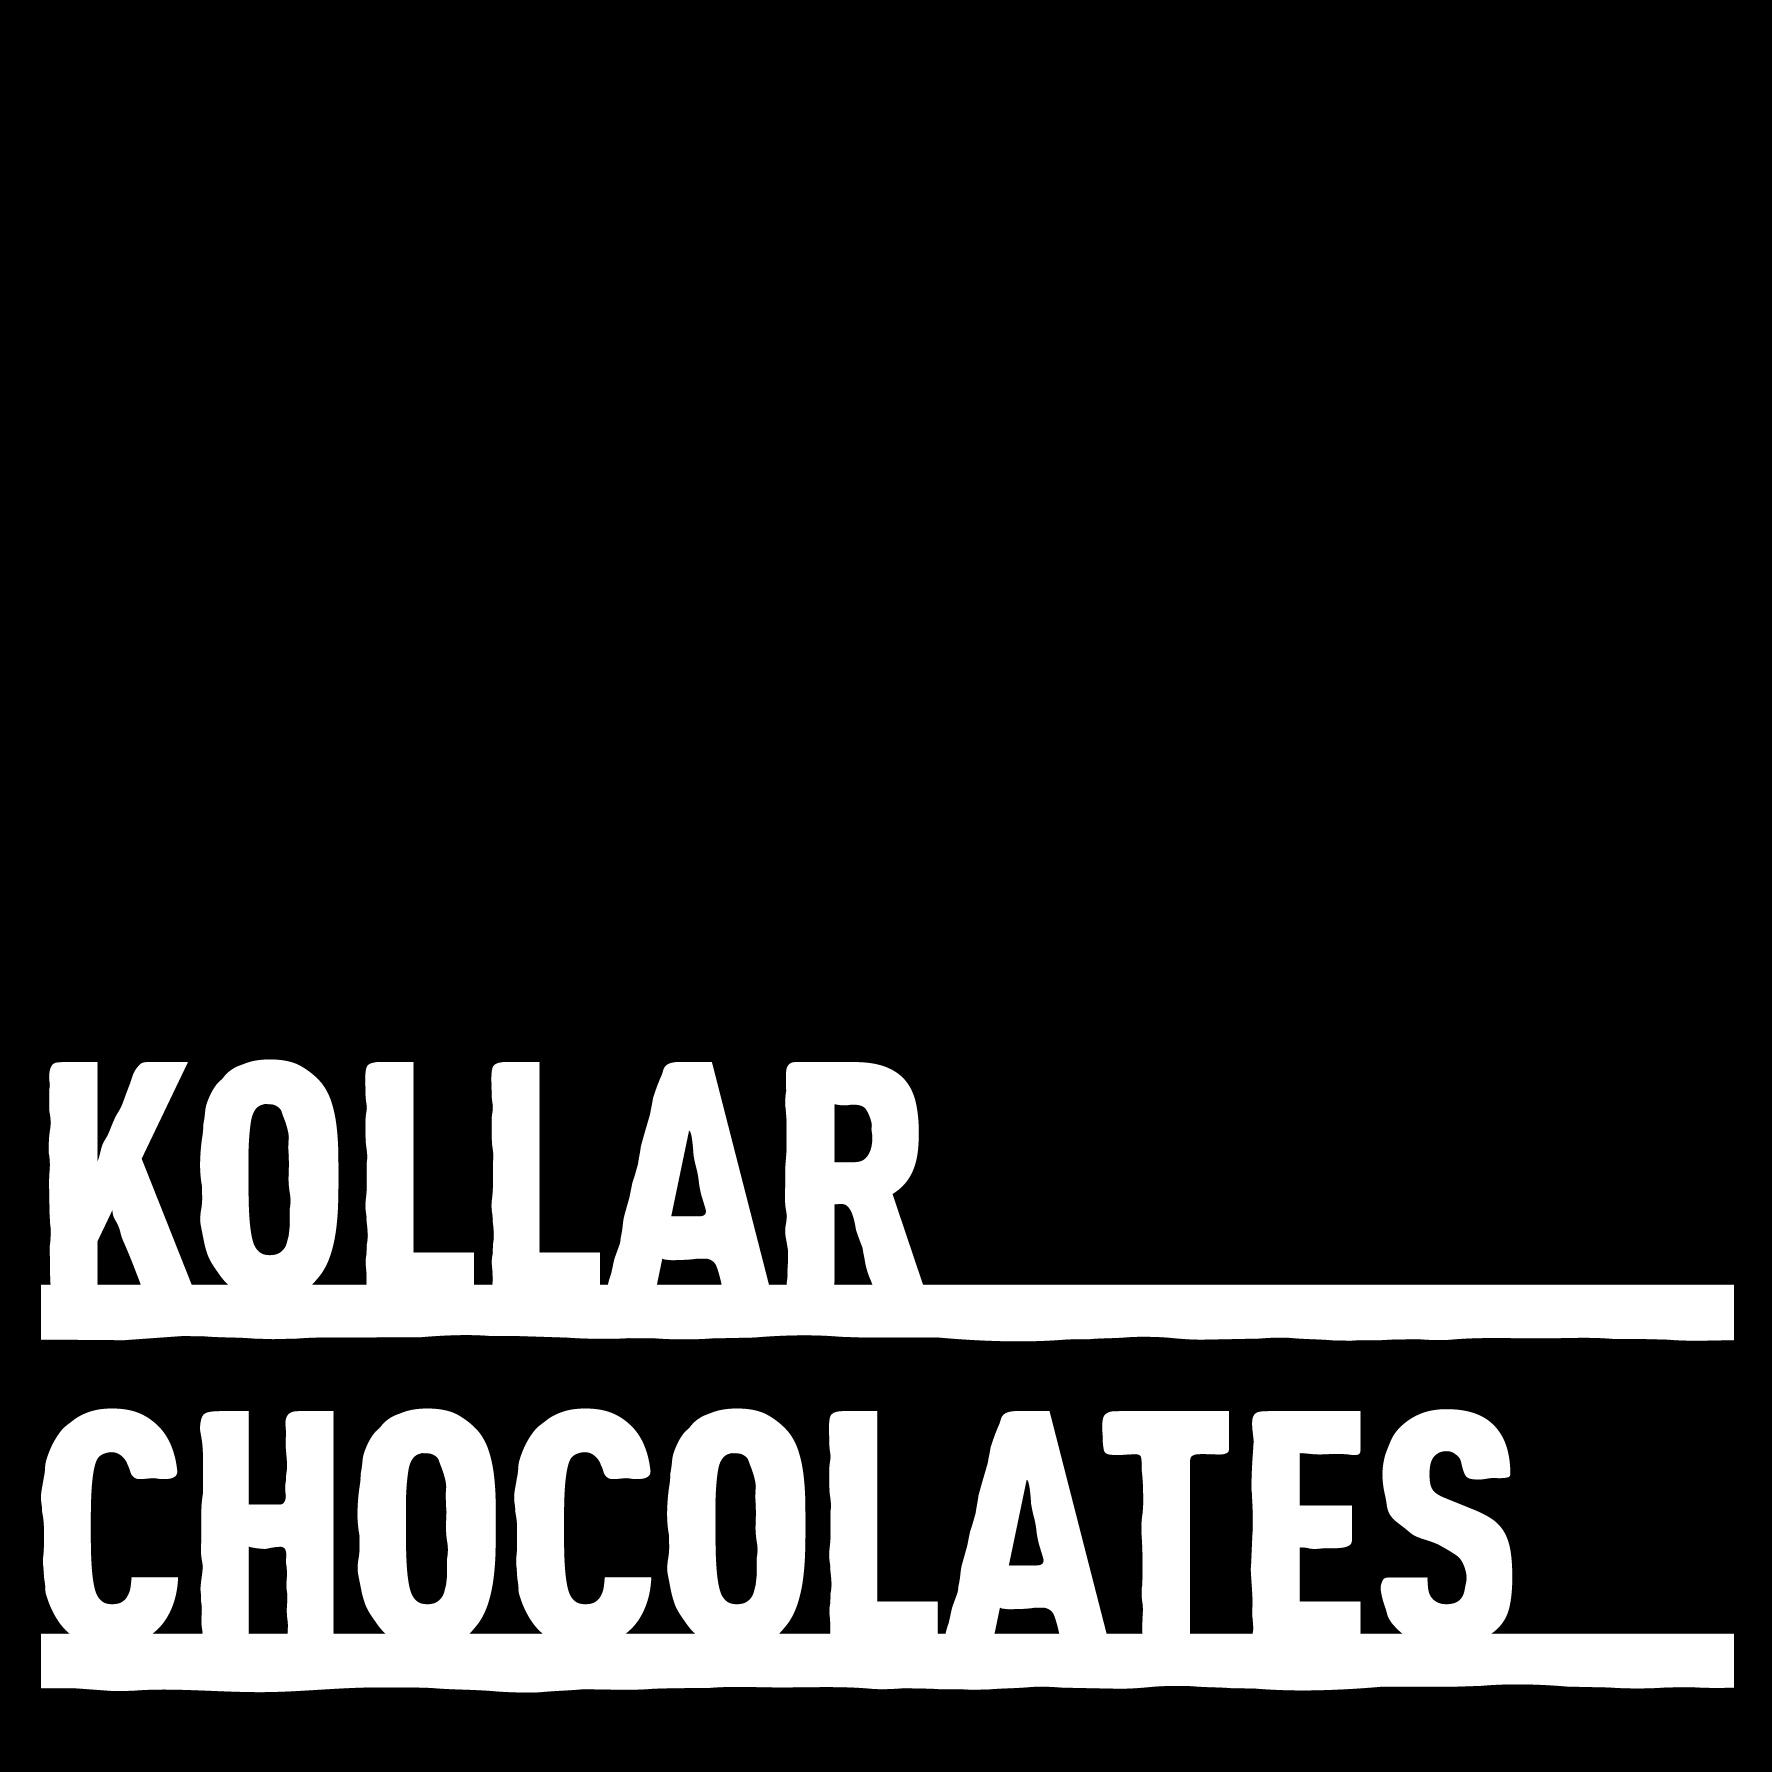 Kollar Chocolates